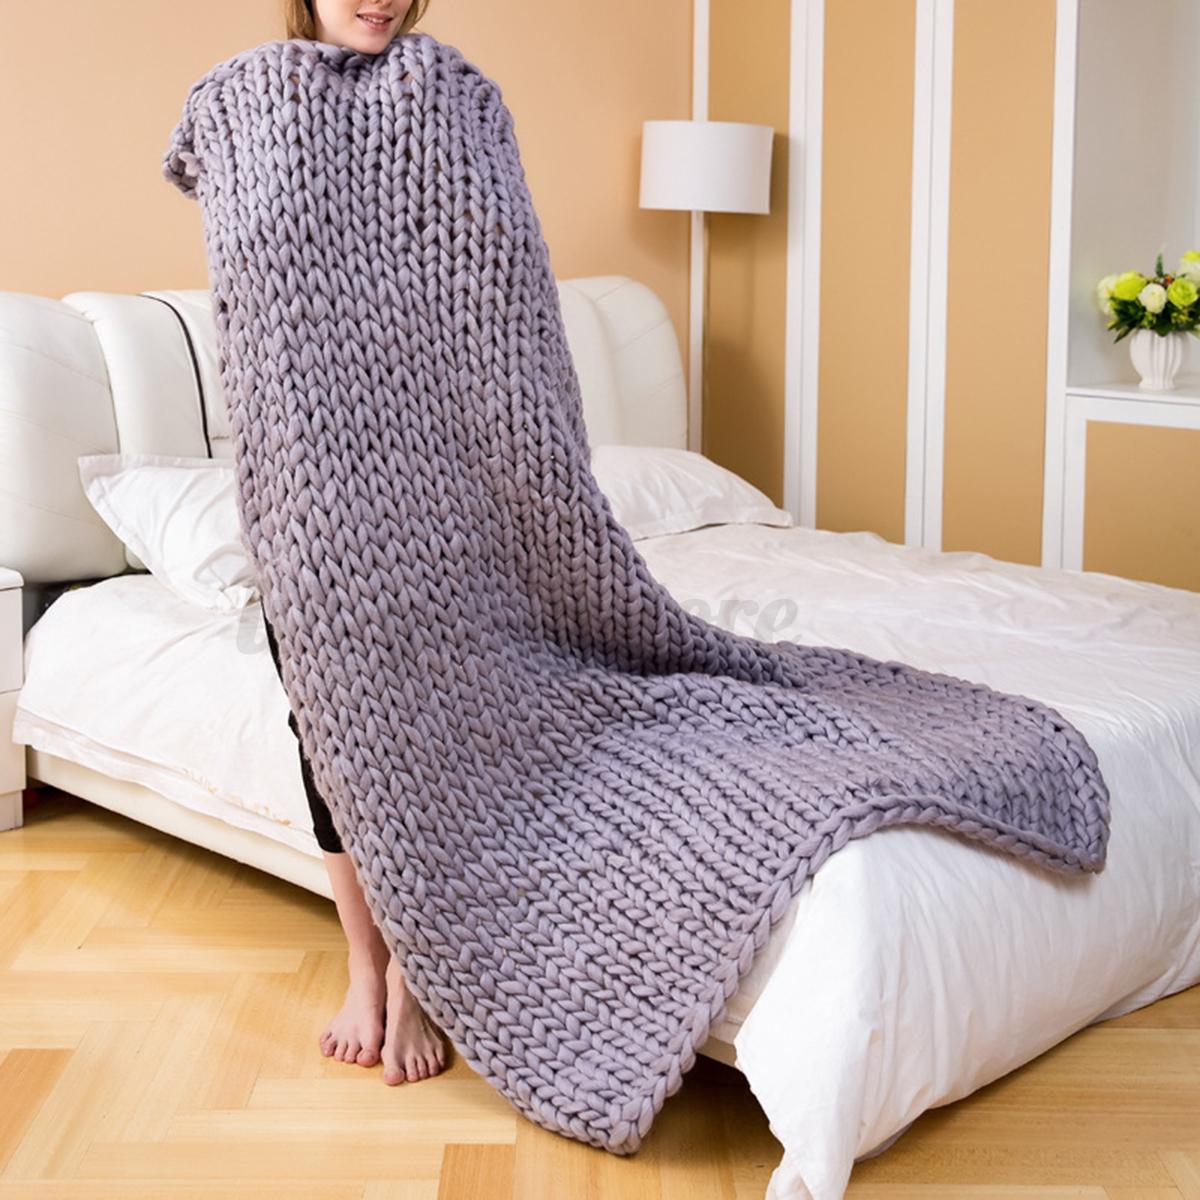 Handmade-Chunky-Knitted-Blanket-Wool-Thick-Line-Yarn-Merino-Throw-Home-6-Sizes